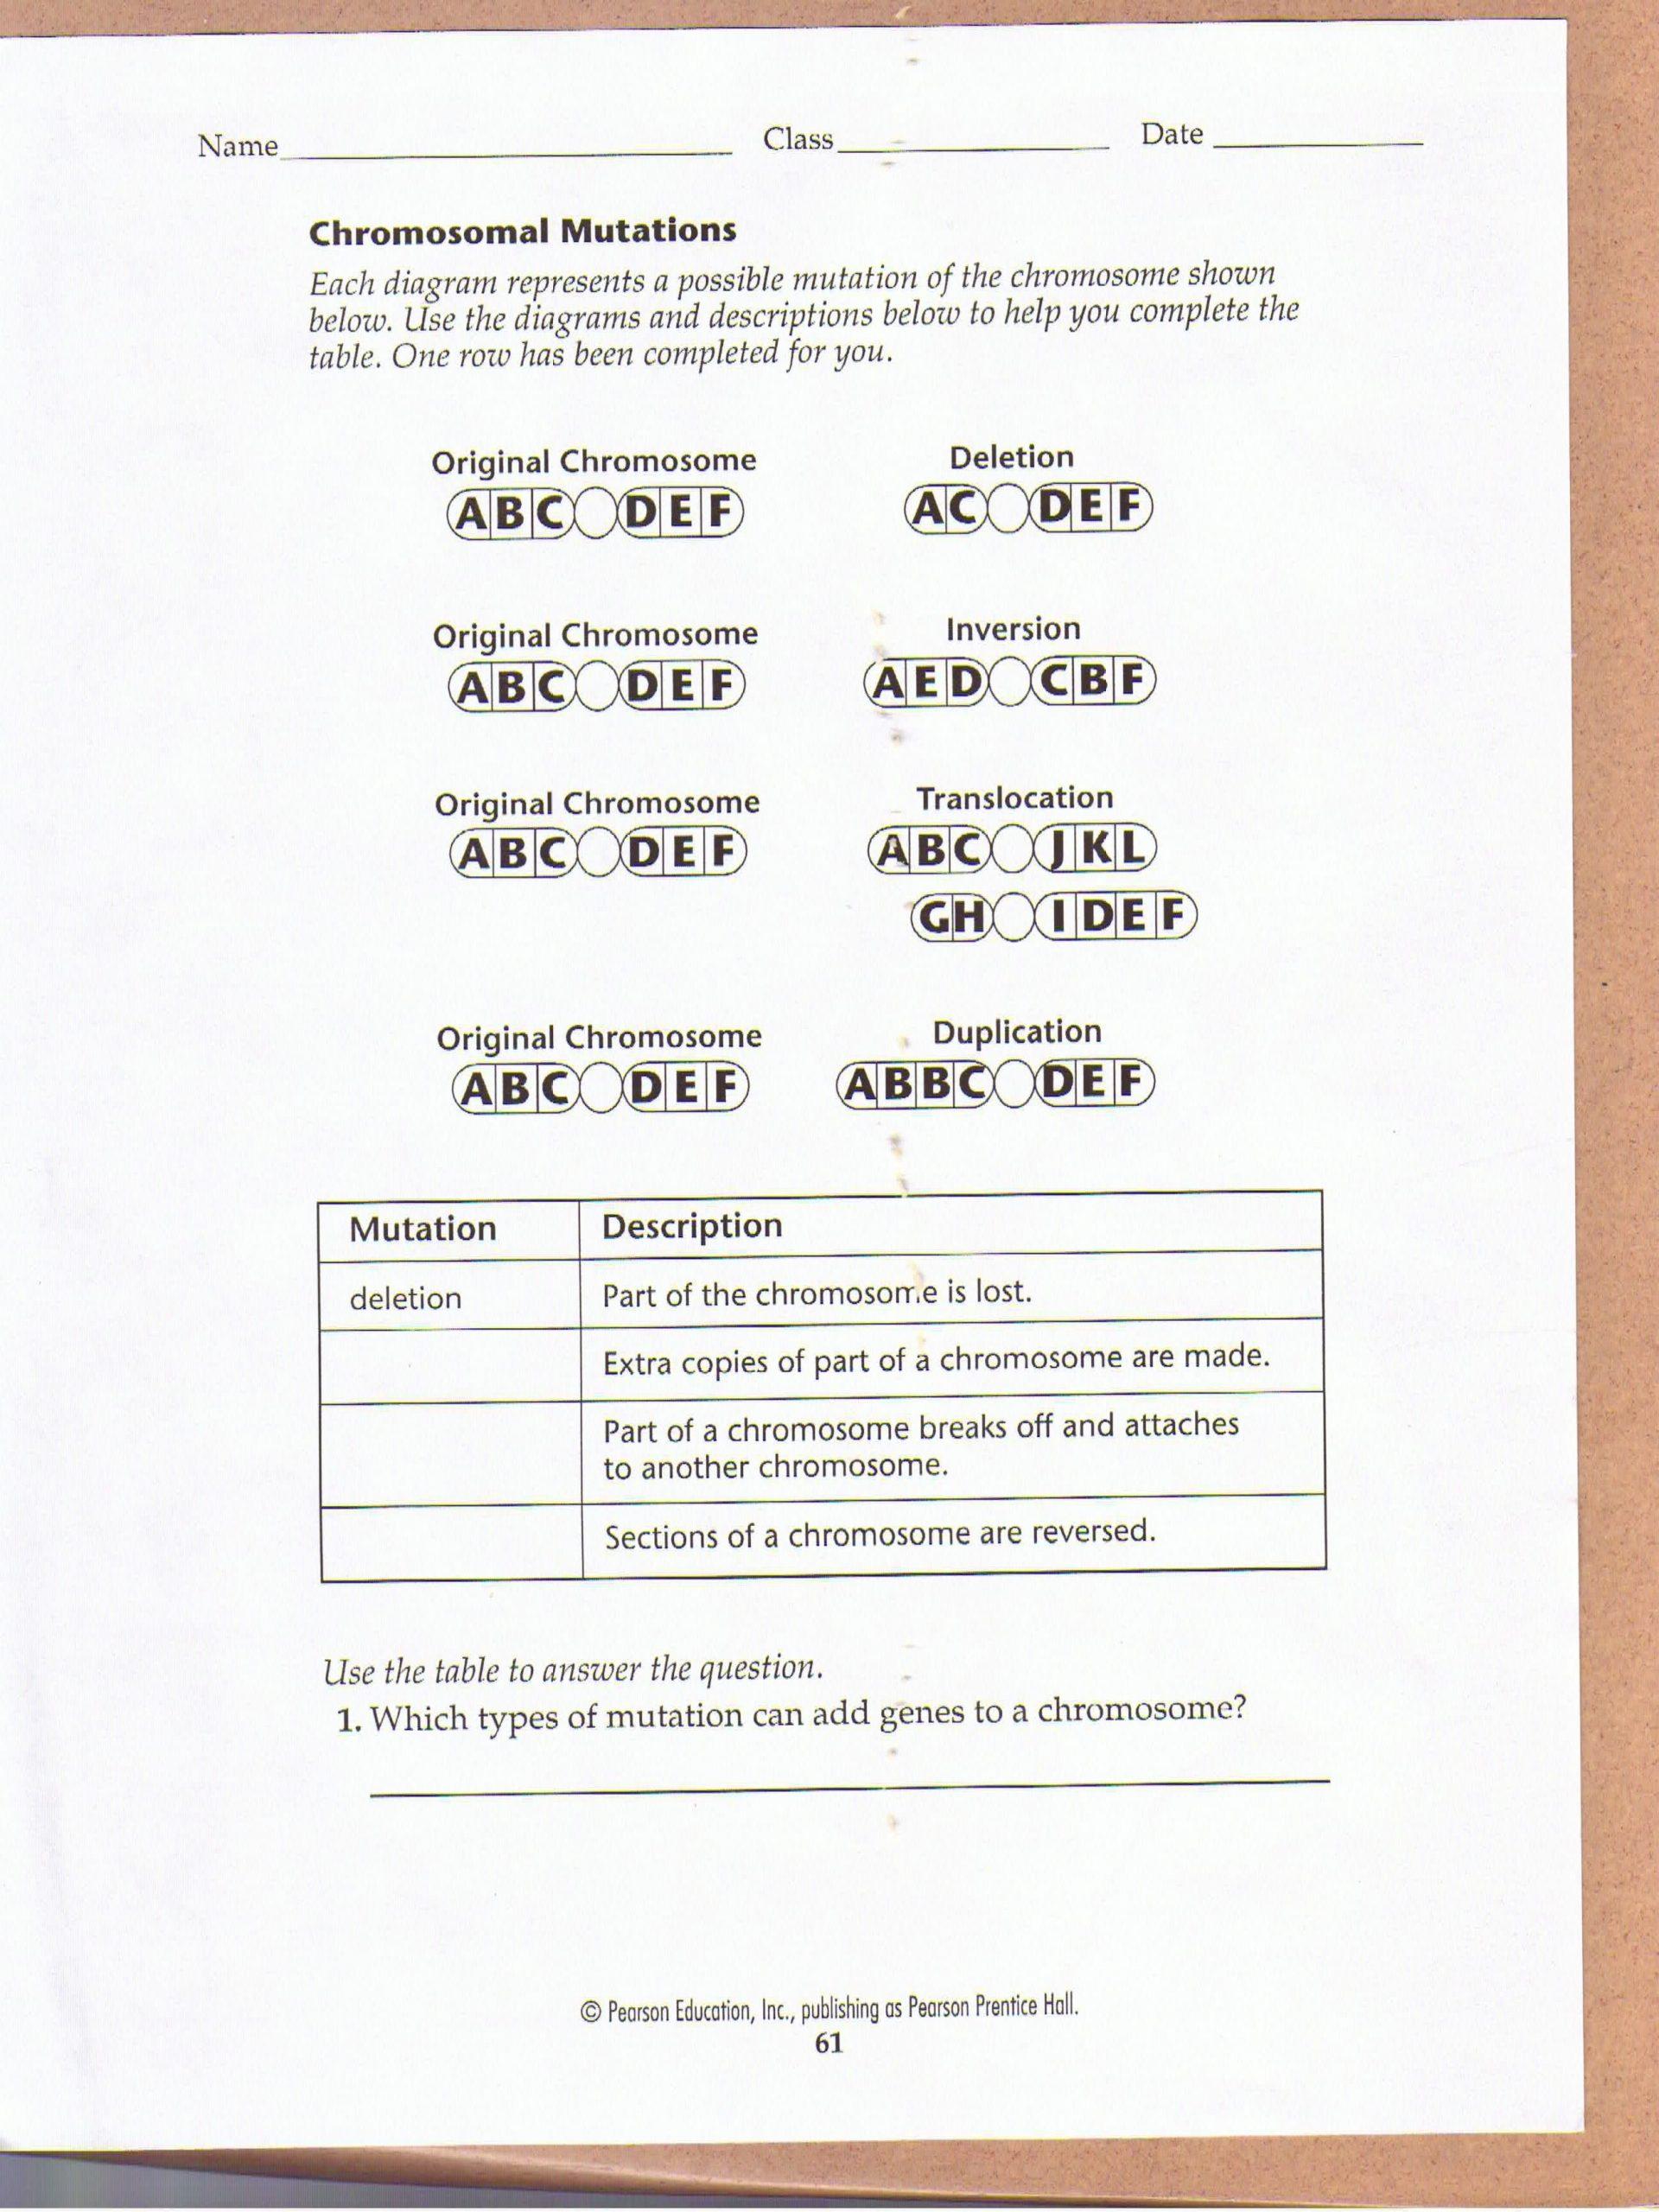 Dna Mutations Practice Worksheet Answers Chromosomal Mutations Worksheet